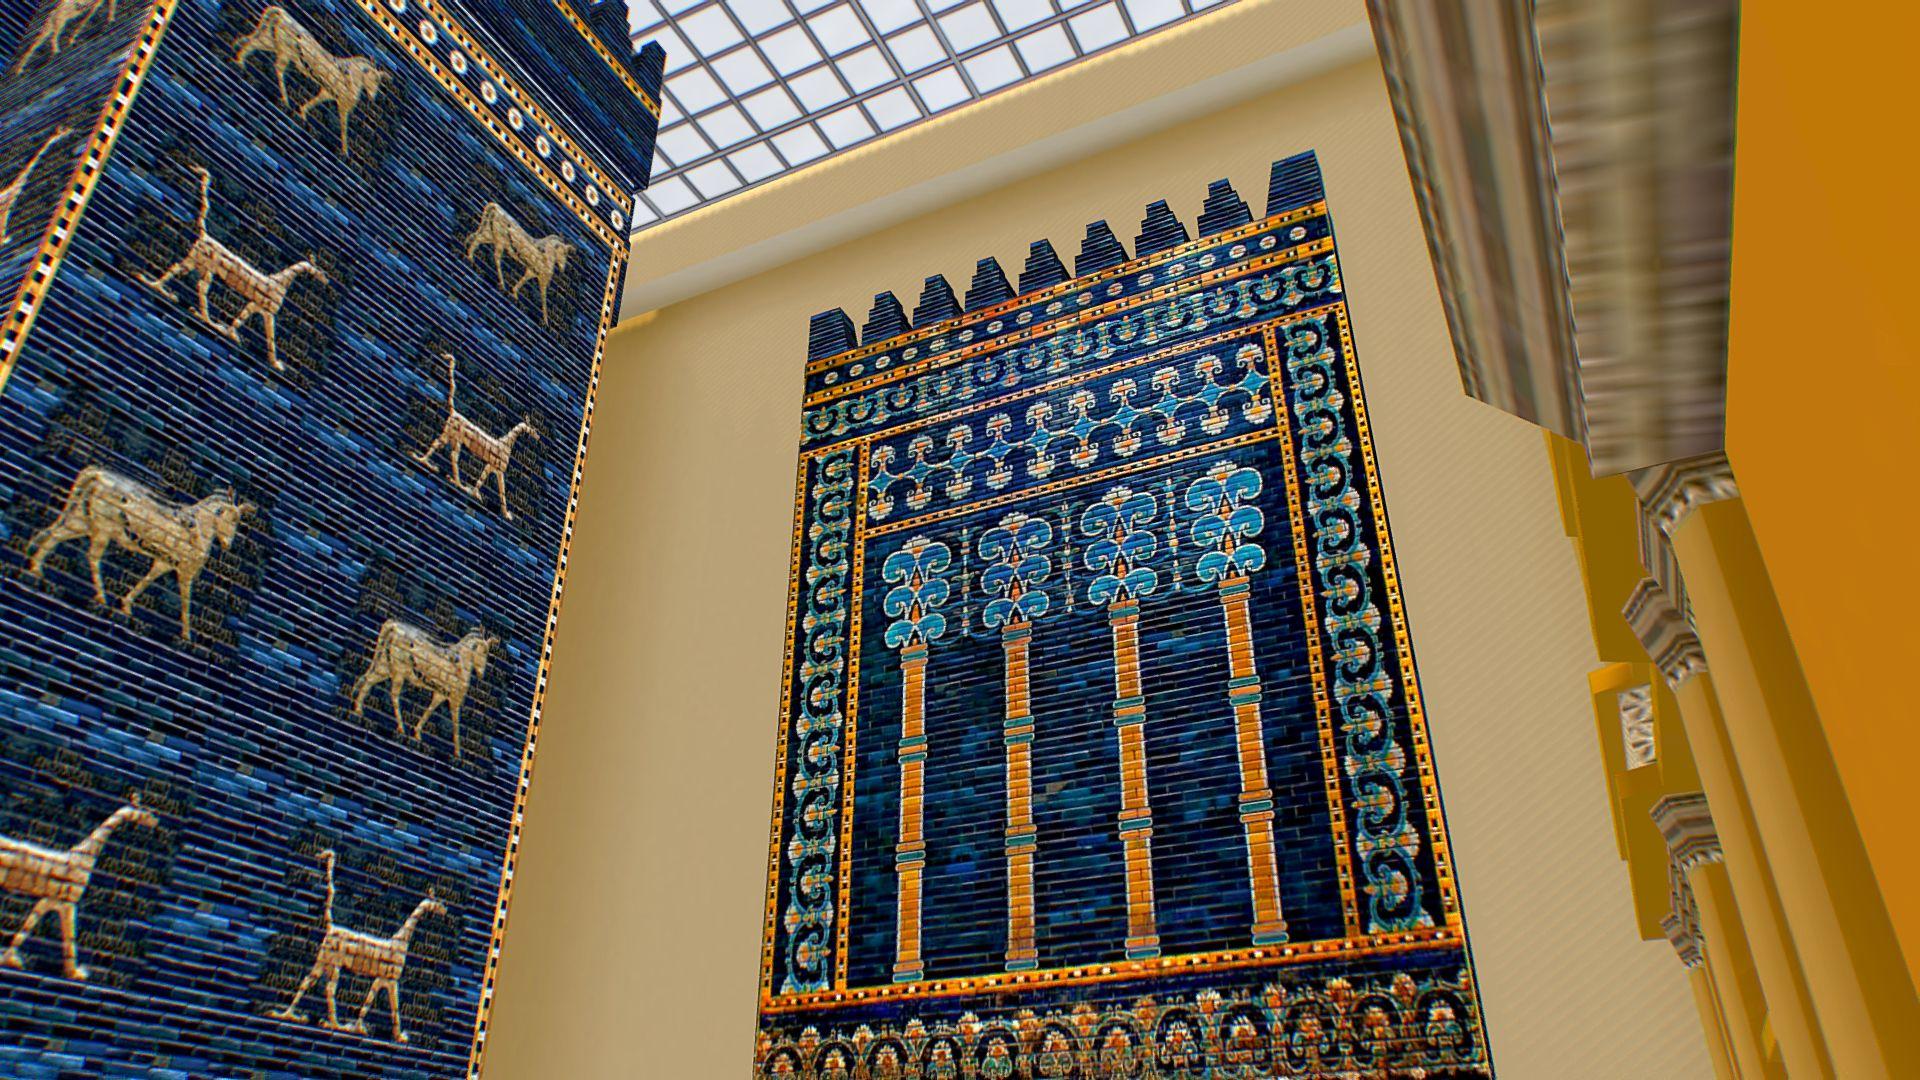 Pergamon Museum Babylon Mesopotamia Ishtar Gate Pergamon Museum Pergamon Mesopotamia